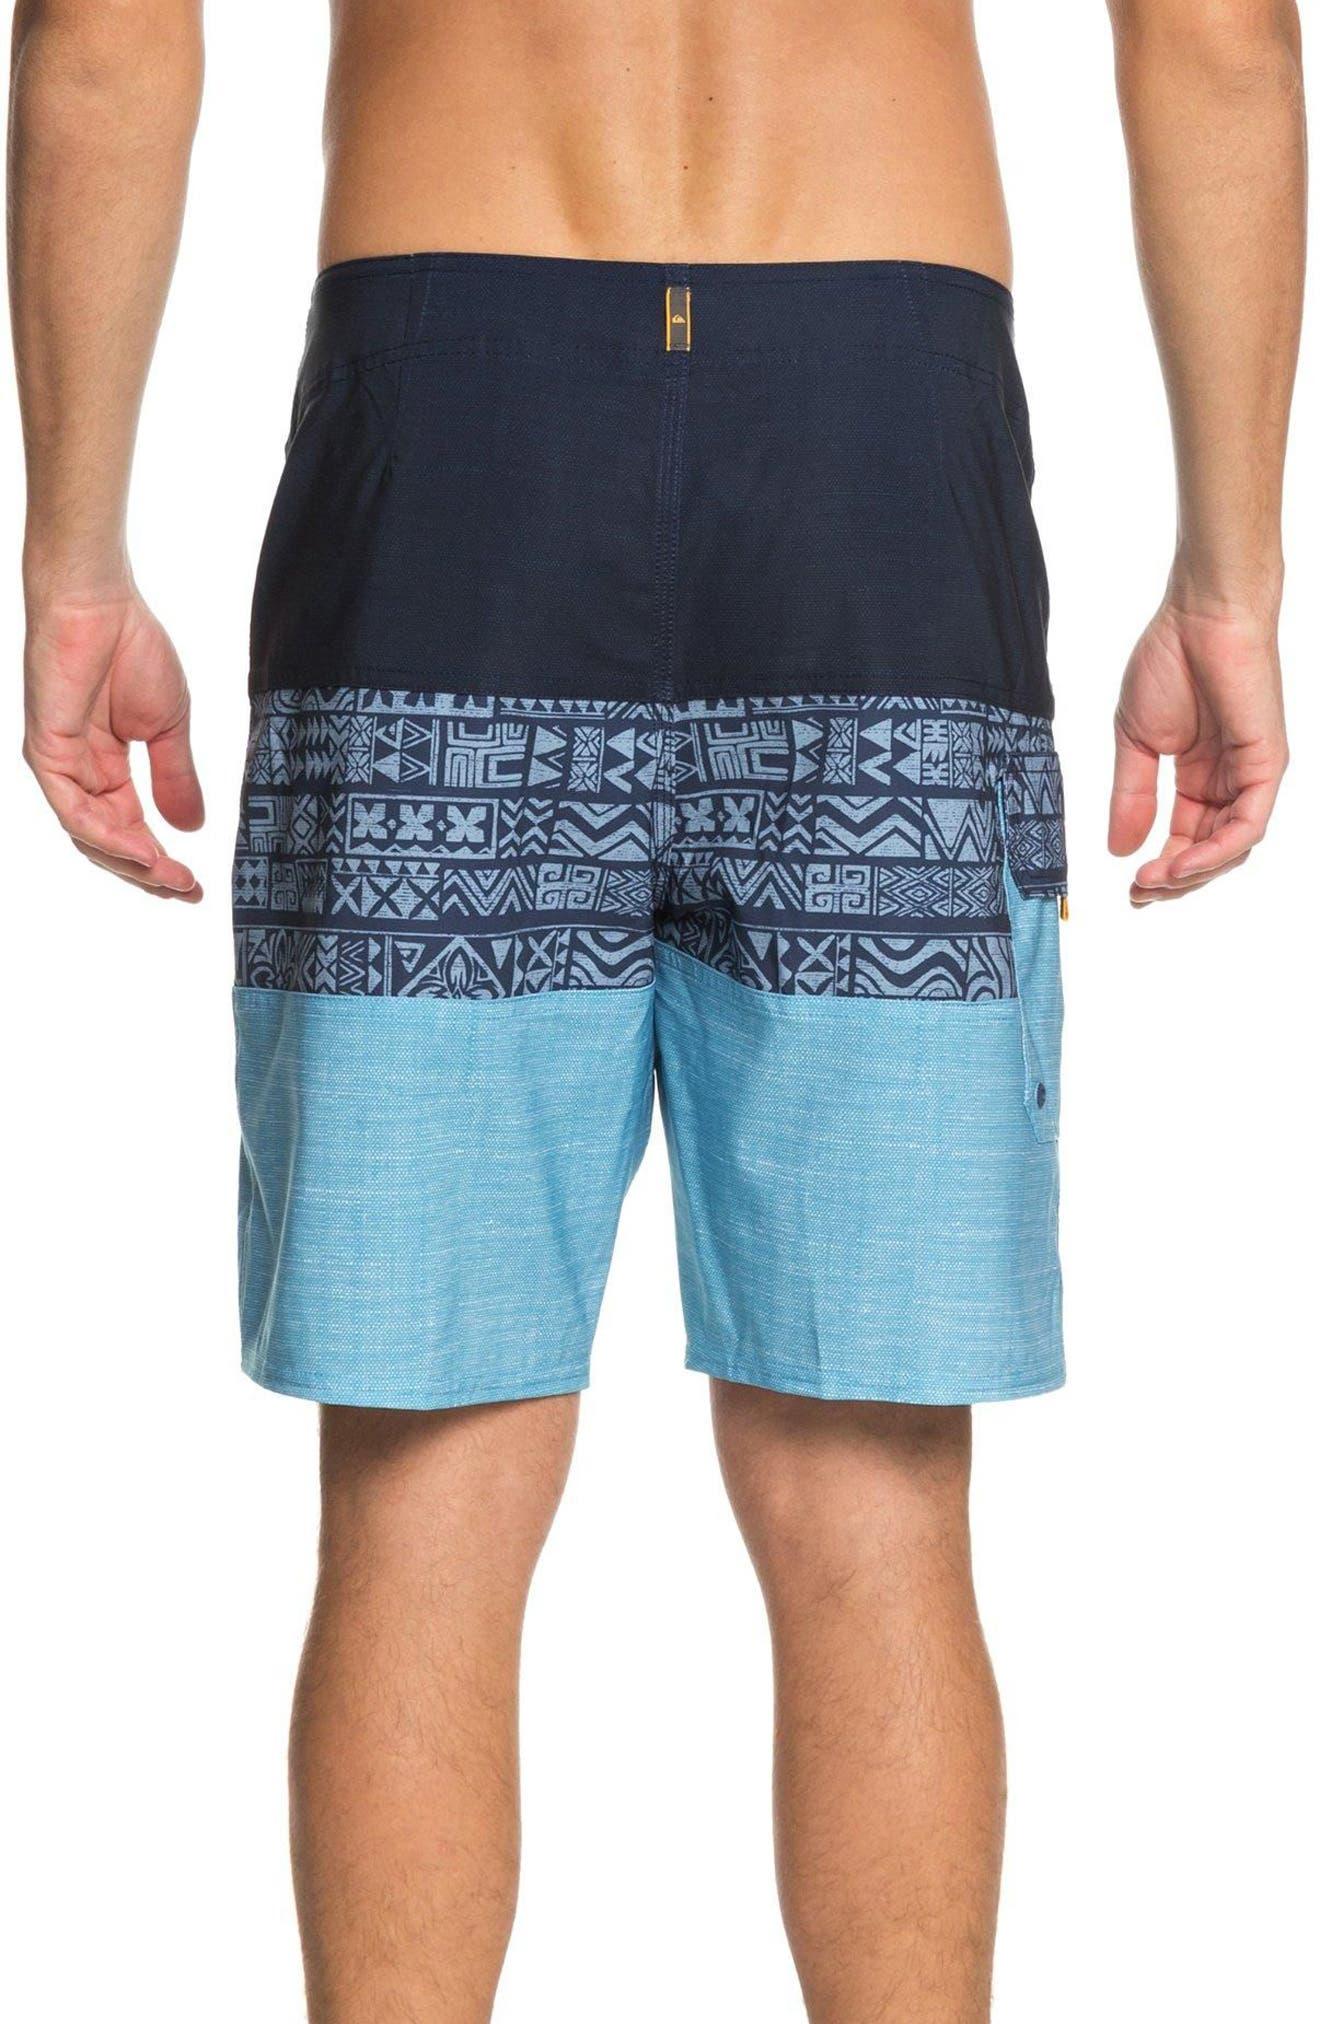 Fairway Triblock Board Shorts,                             Alternate thumbnail 2, color,                             401